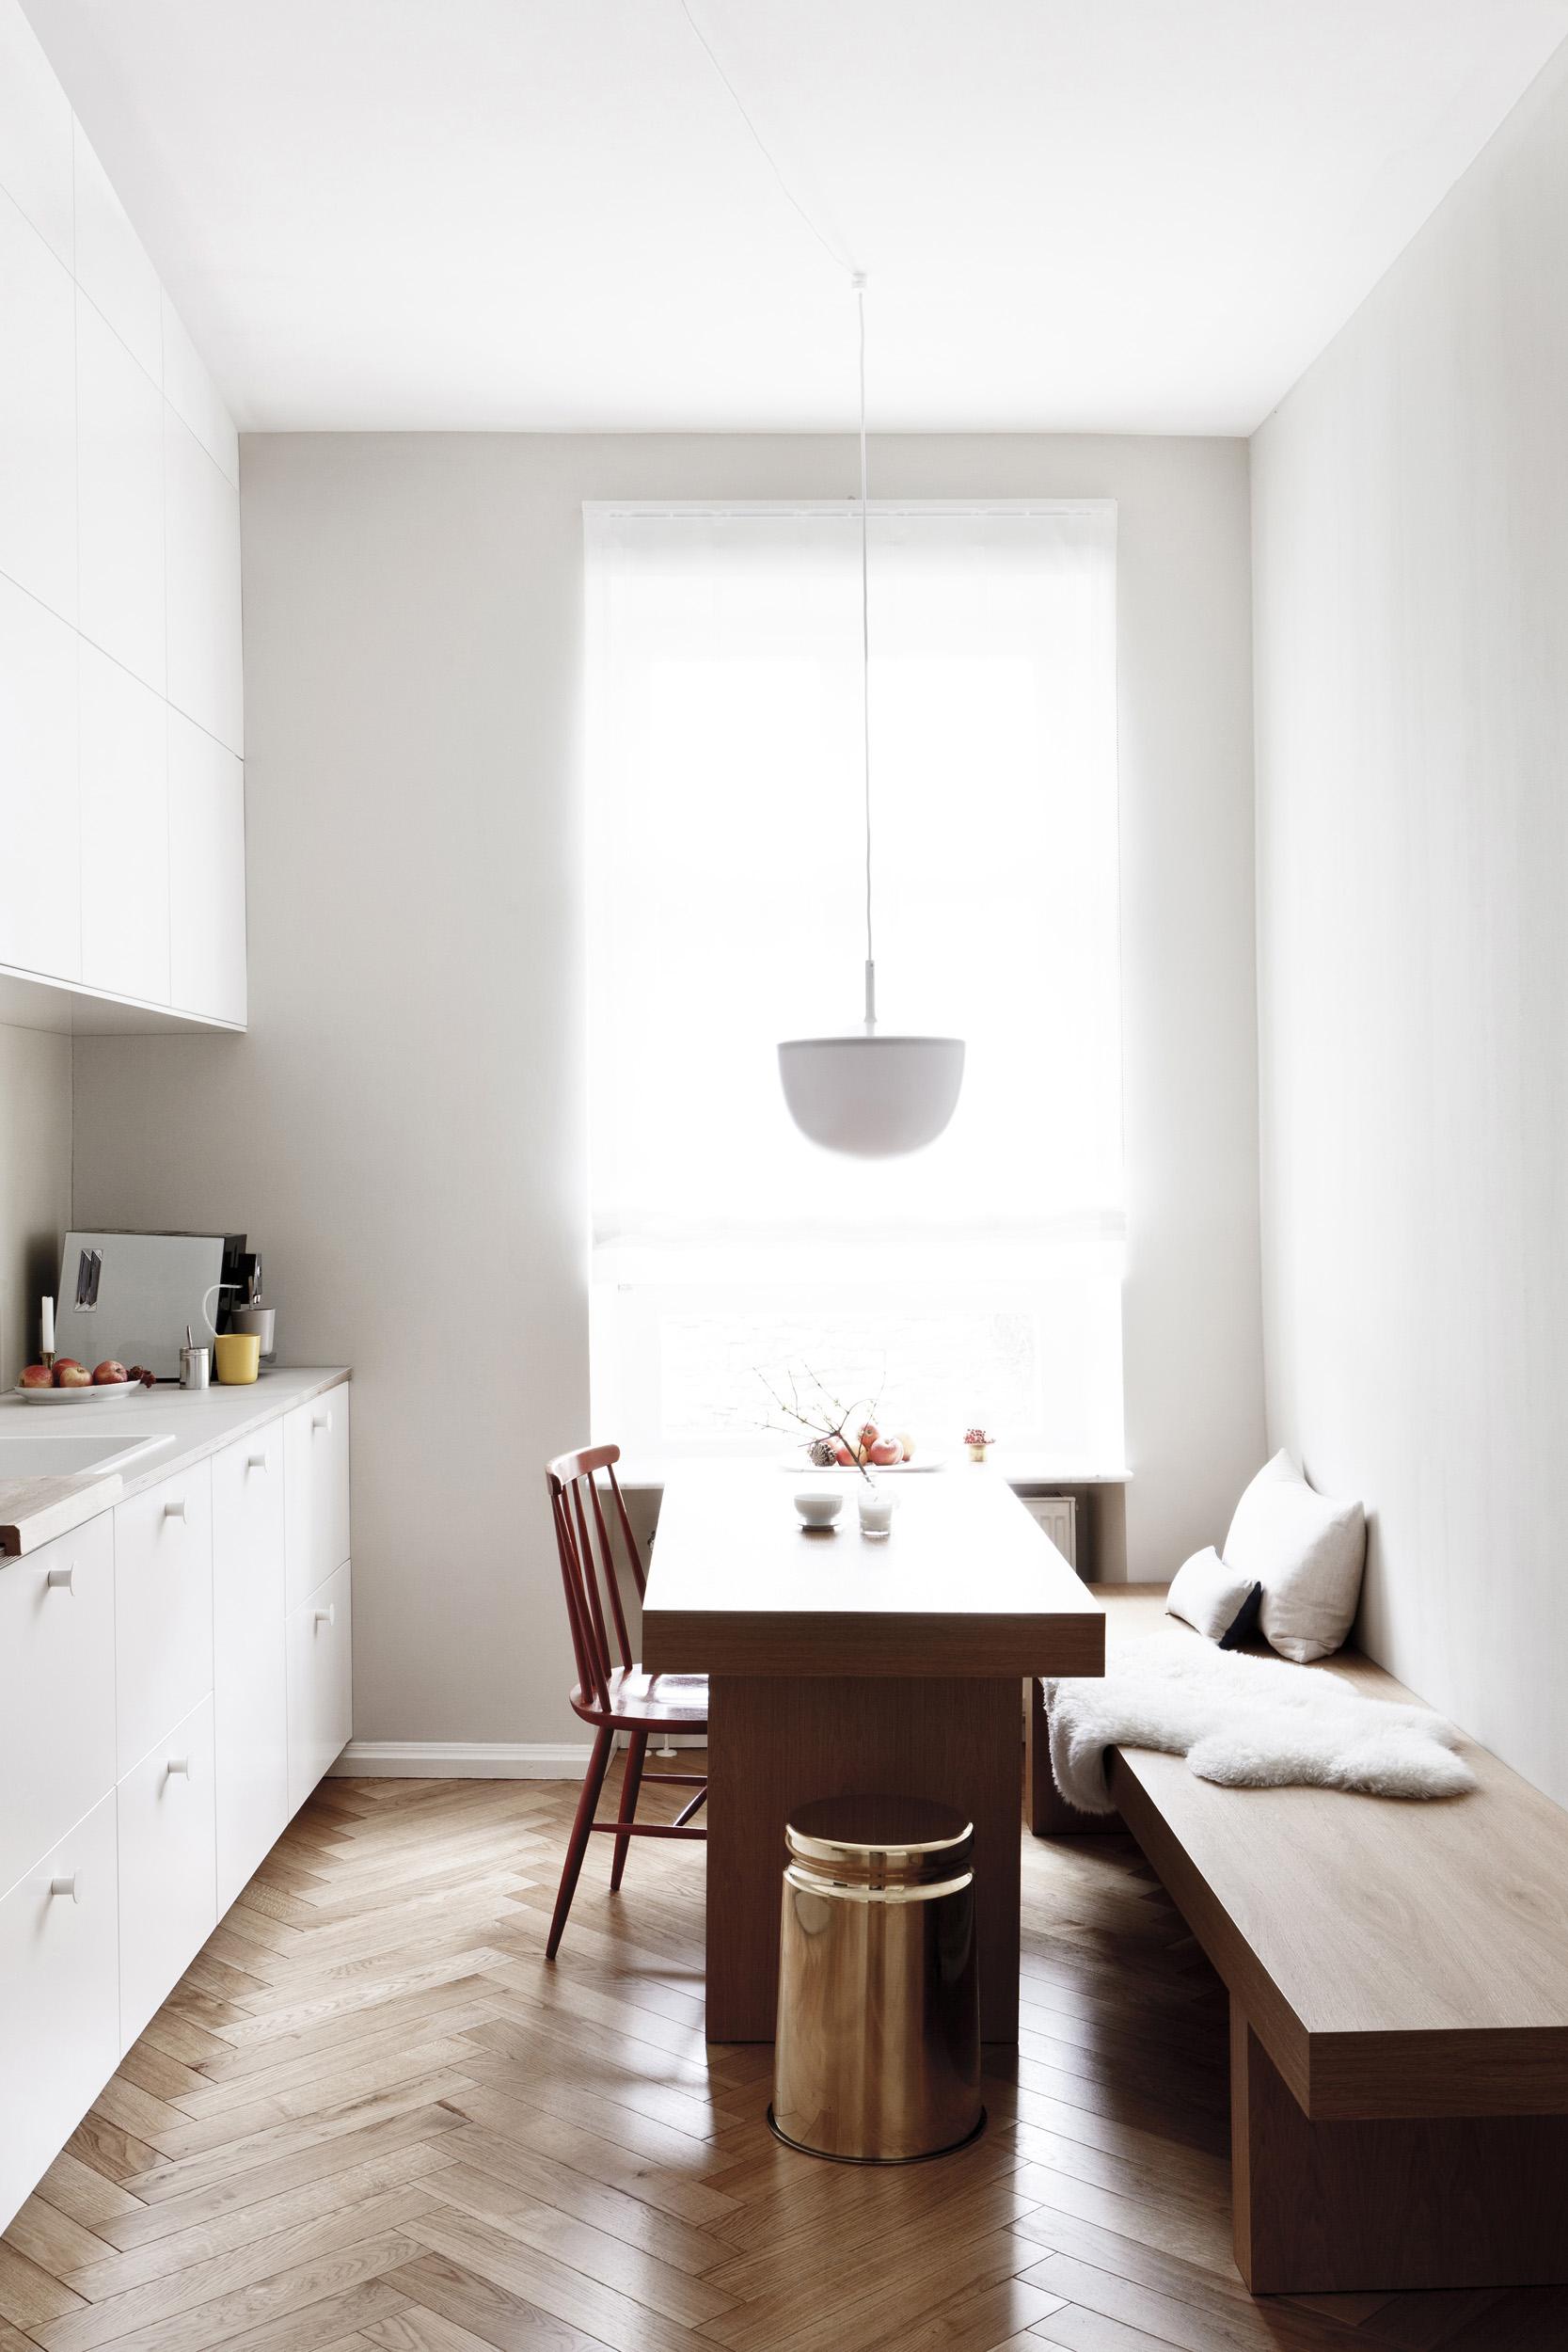 Studio-Oink-House-Cal-II-apartment-remodel-Mainz-Germany-Remodelista-1J.jpg